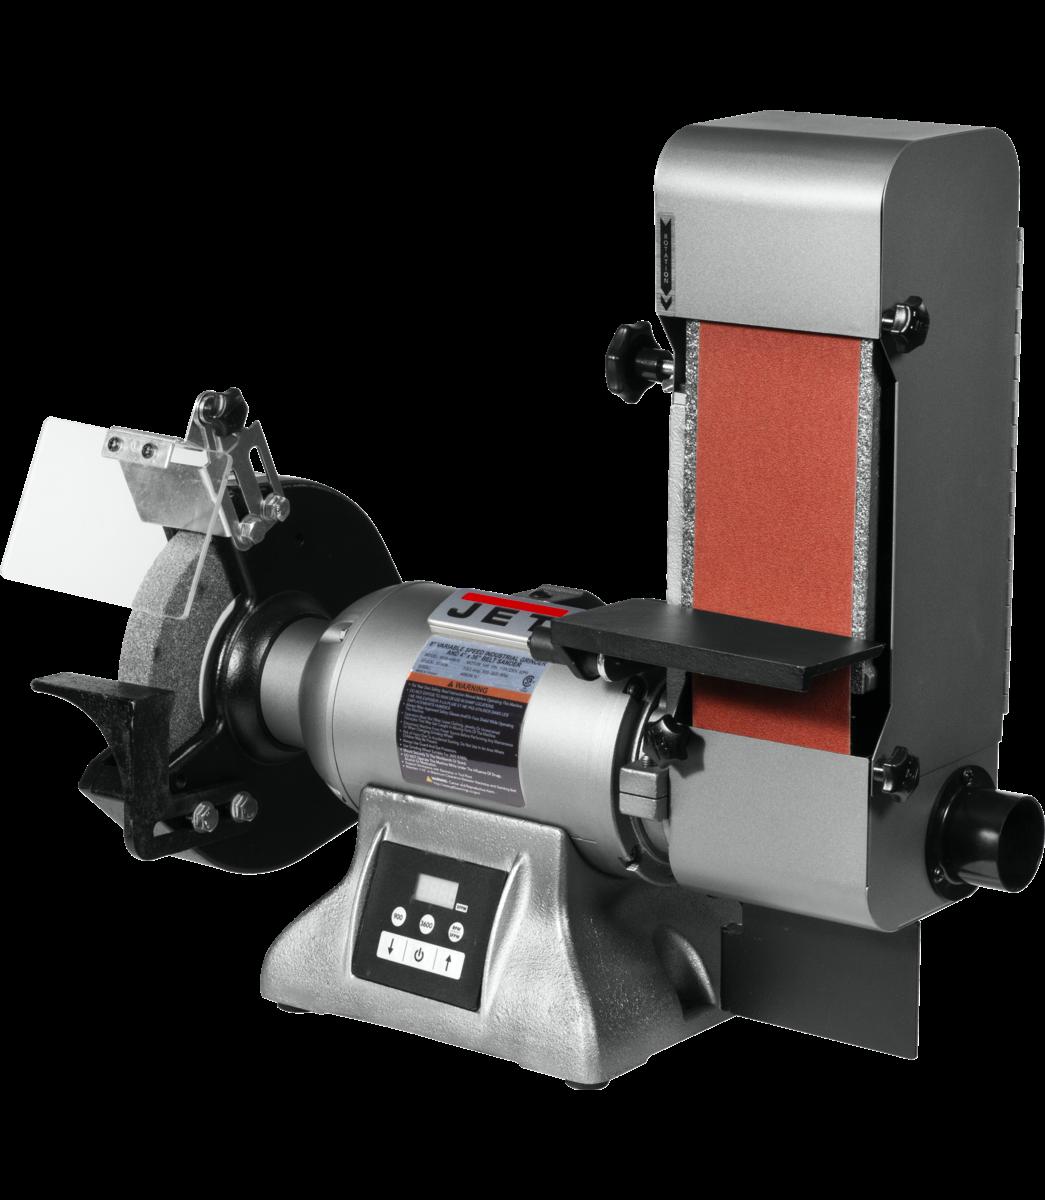 IBGB-436VS 8-Inch Variable Speed Industrial Grinder and  4 x 36 Belt Sander